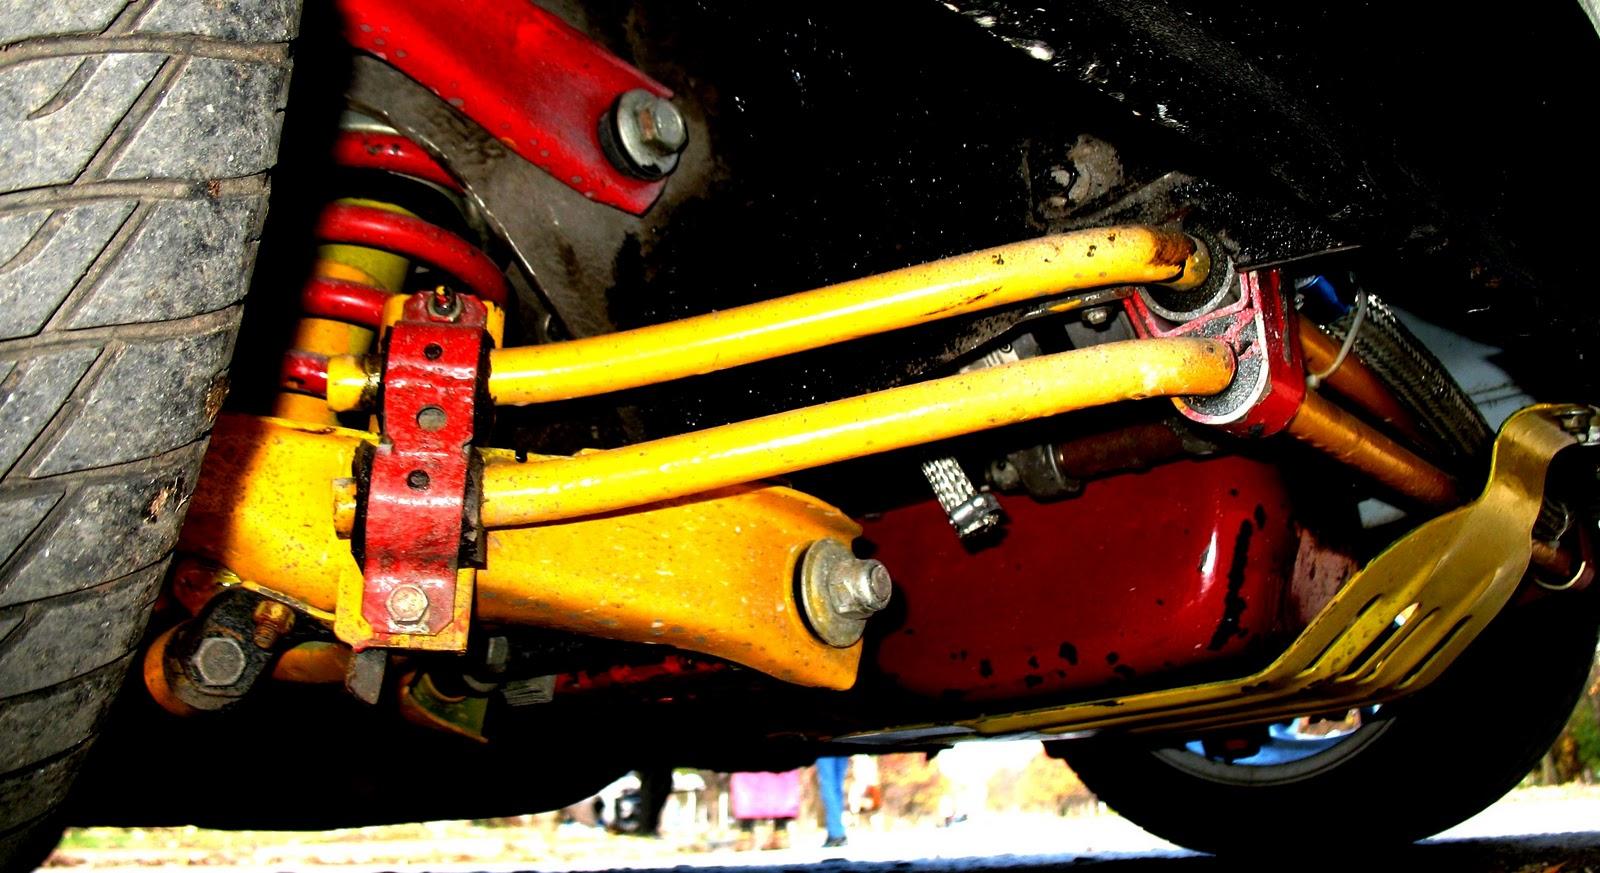 56Ваз 2107 ремонт передней подвески своими руками